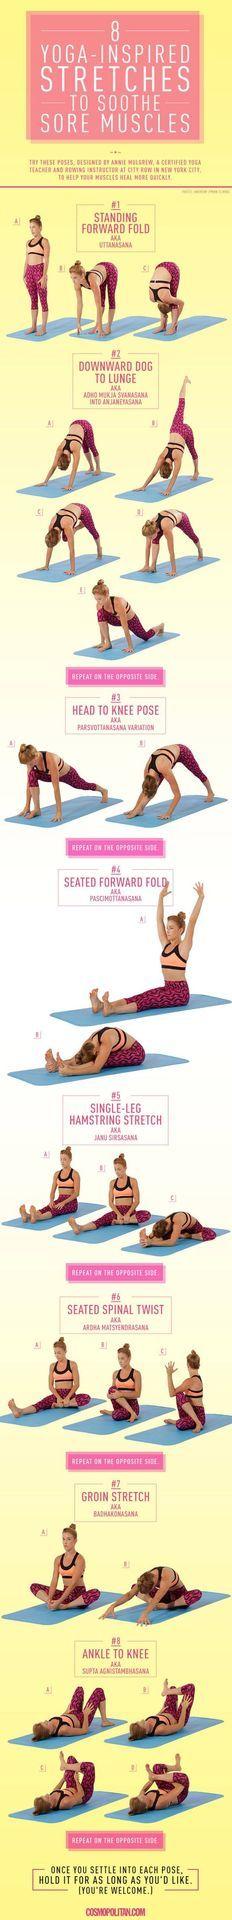 Say hello to yoga fo